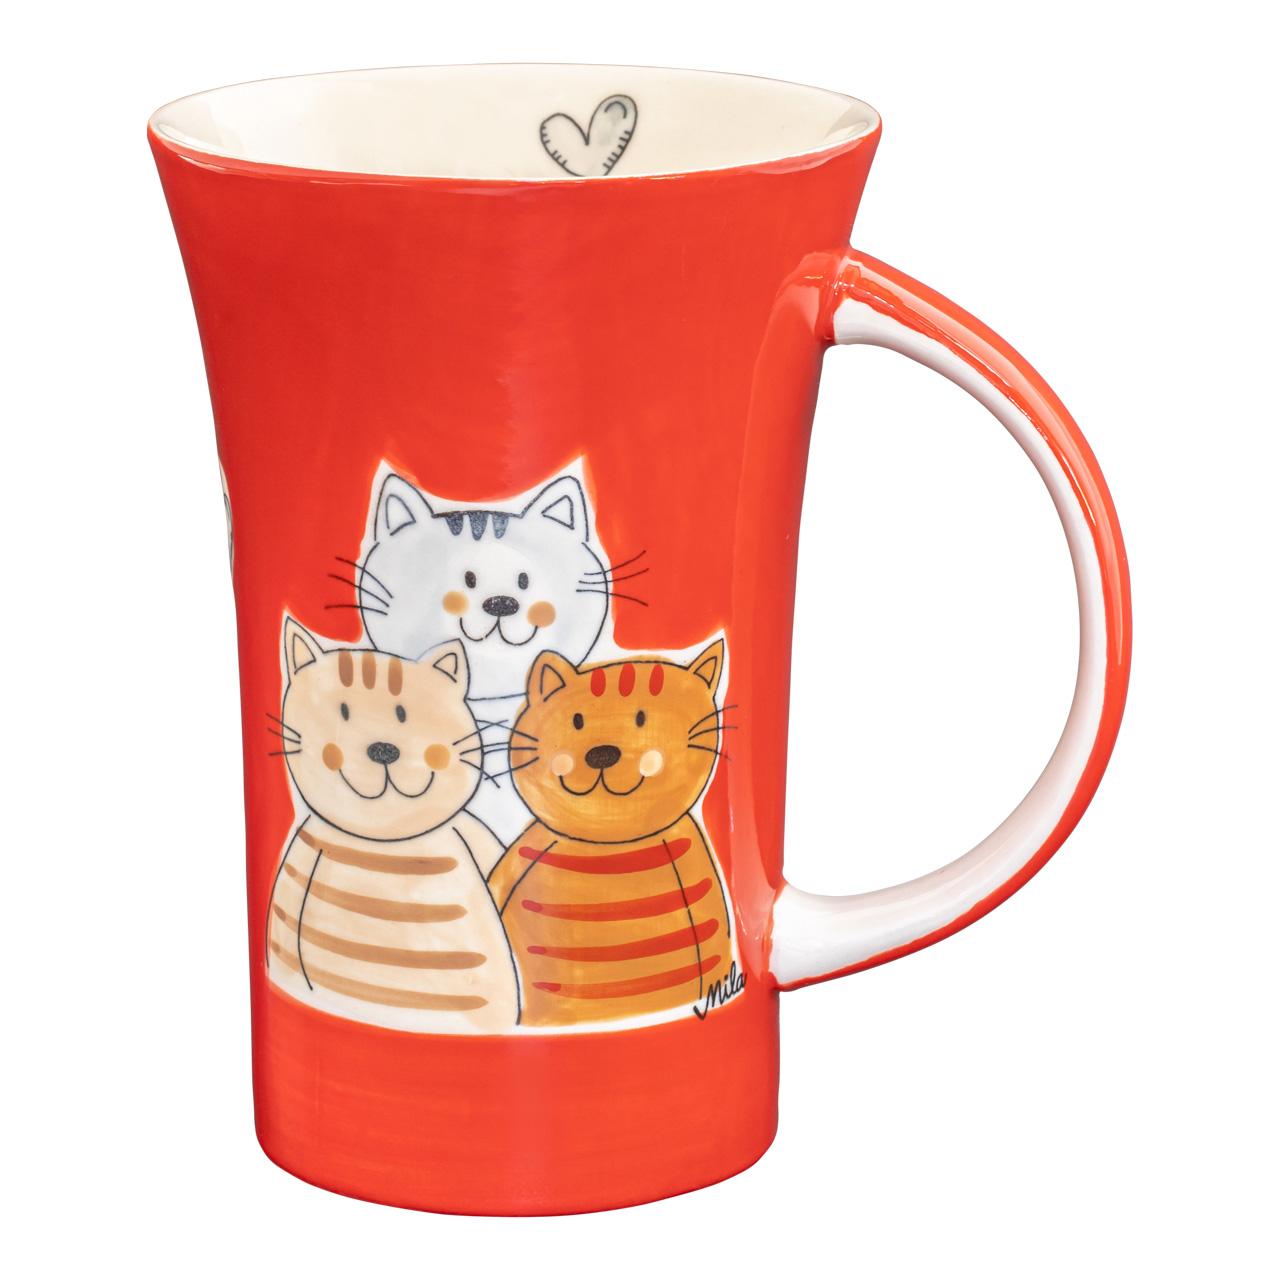 Coffee Pot  - Cuddly cats